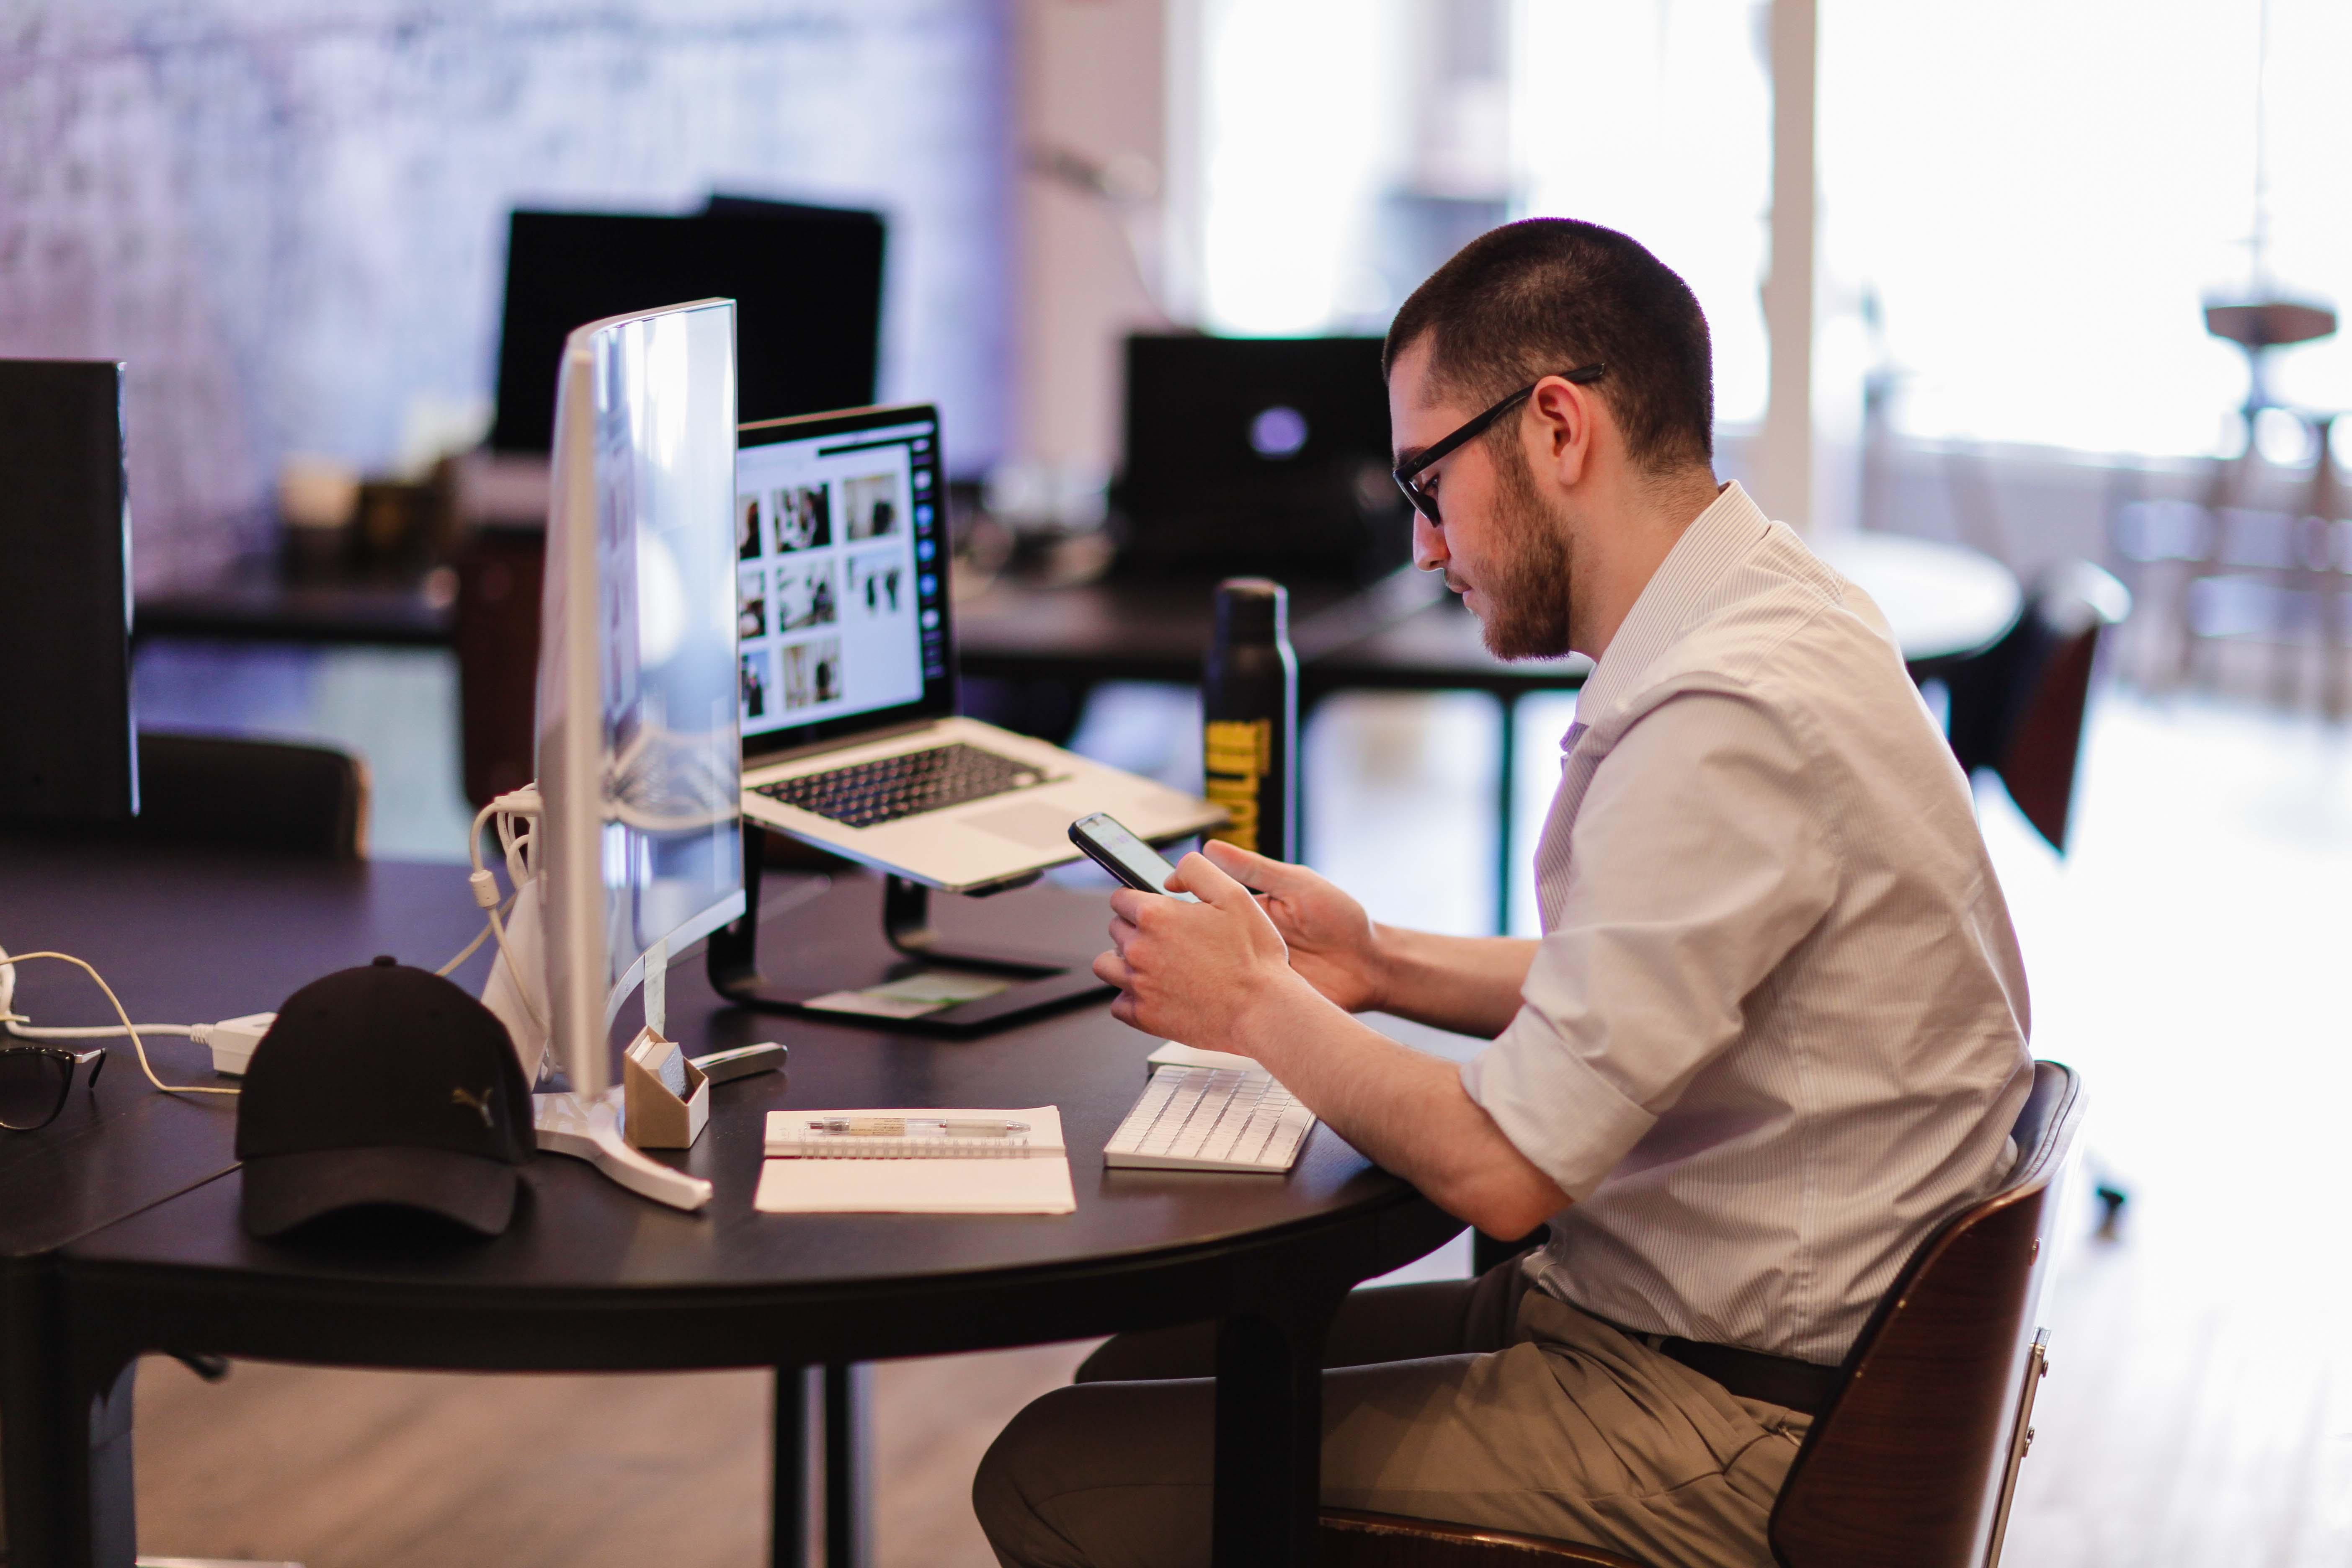 Man sitting at desk using phone